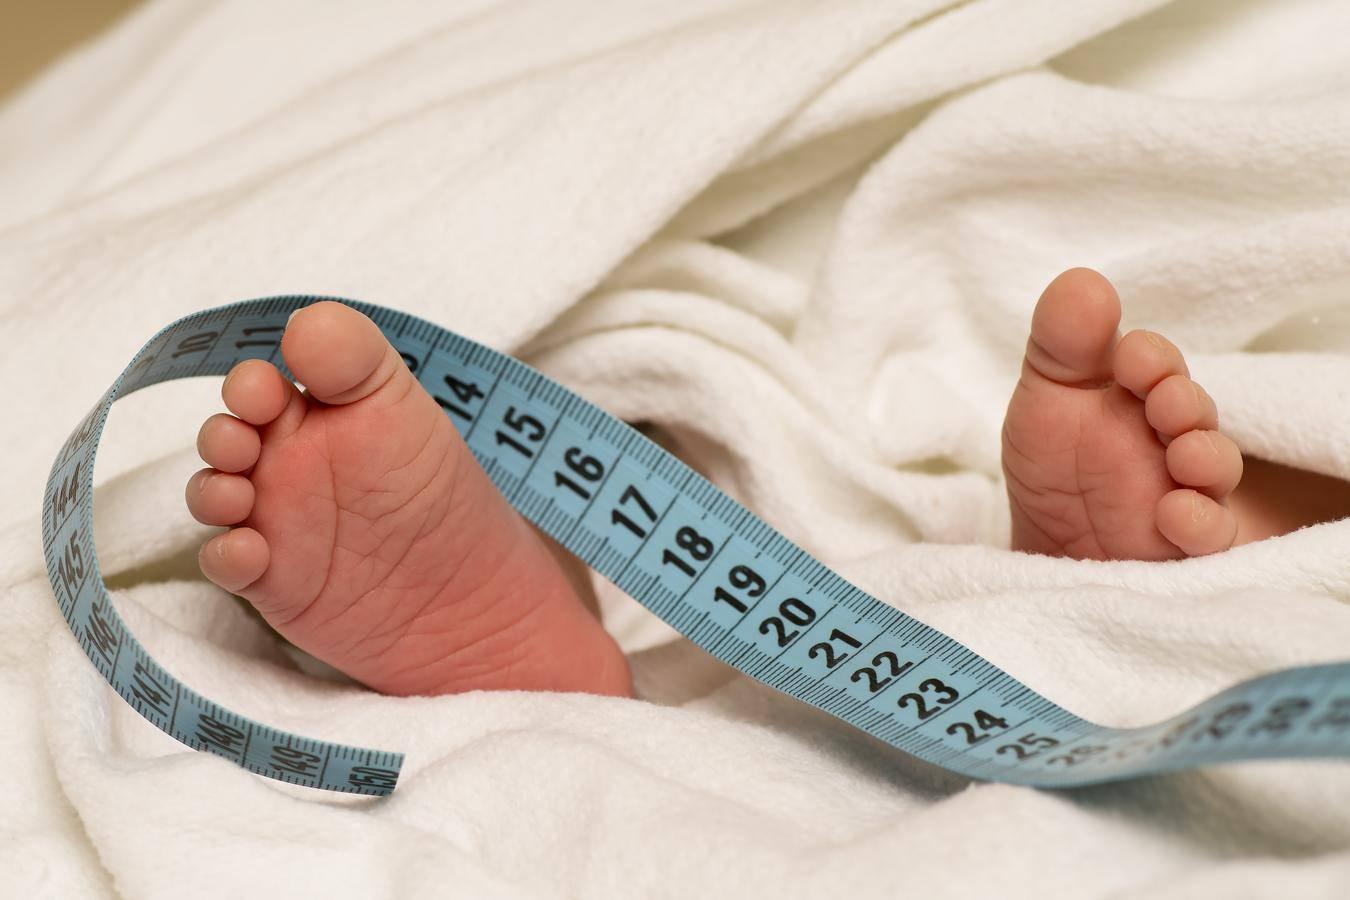 Hebamme / Entbindungspfleger